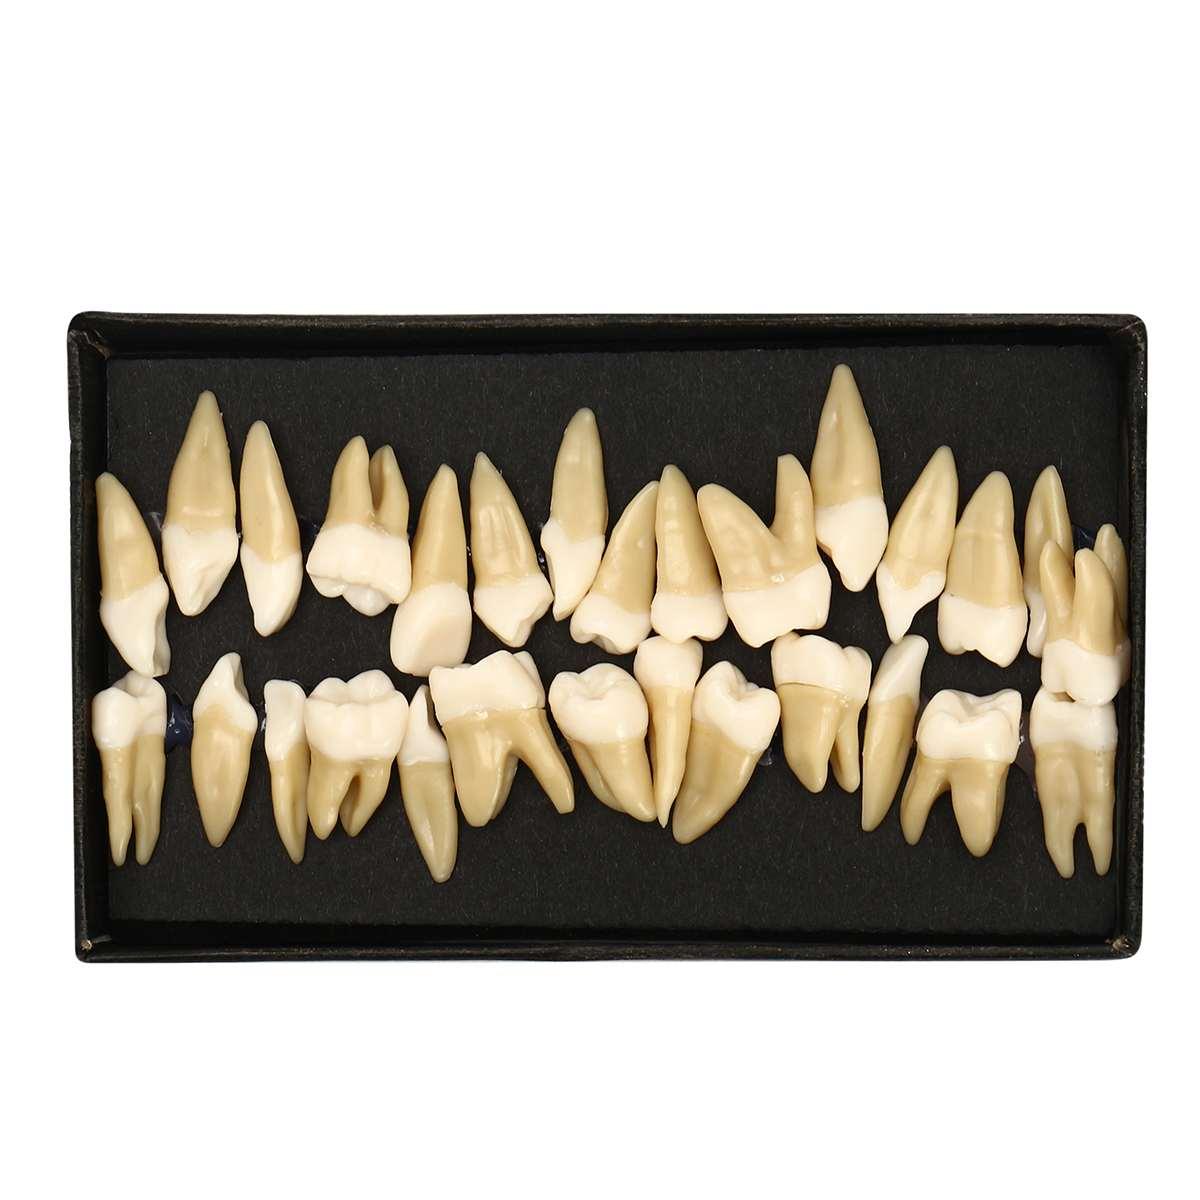 Dental 28 pcs 1:1 demonstration permanent teeth teach study model Dental Implant Dentist Practice Product Dental teaching modelDental 28 pcs 1:1 demonstration permanent teeth teach study model Dental Implant Dentist Practice Product Dental teaching model